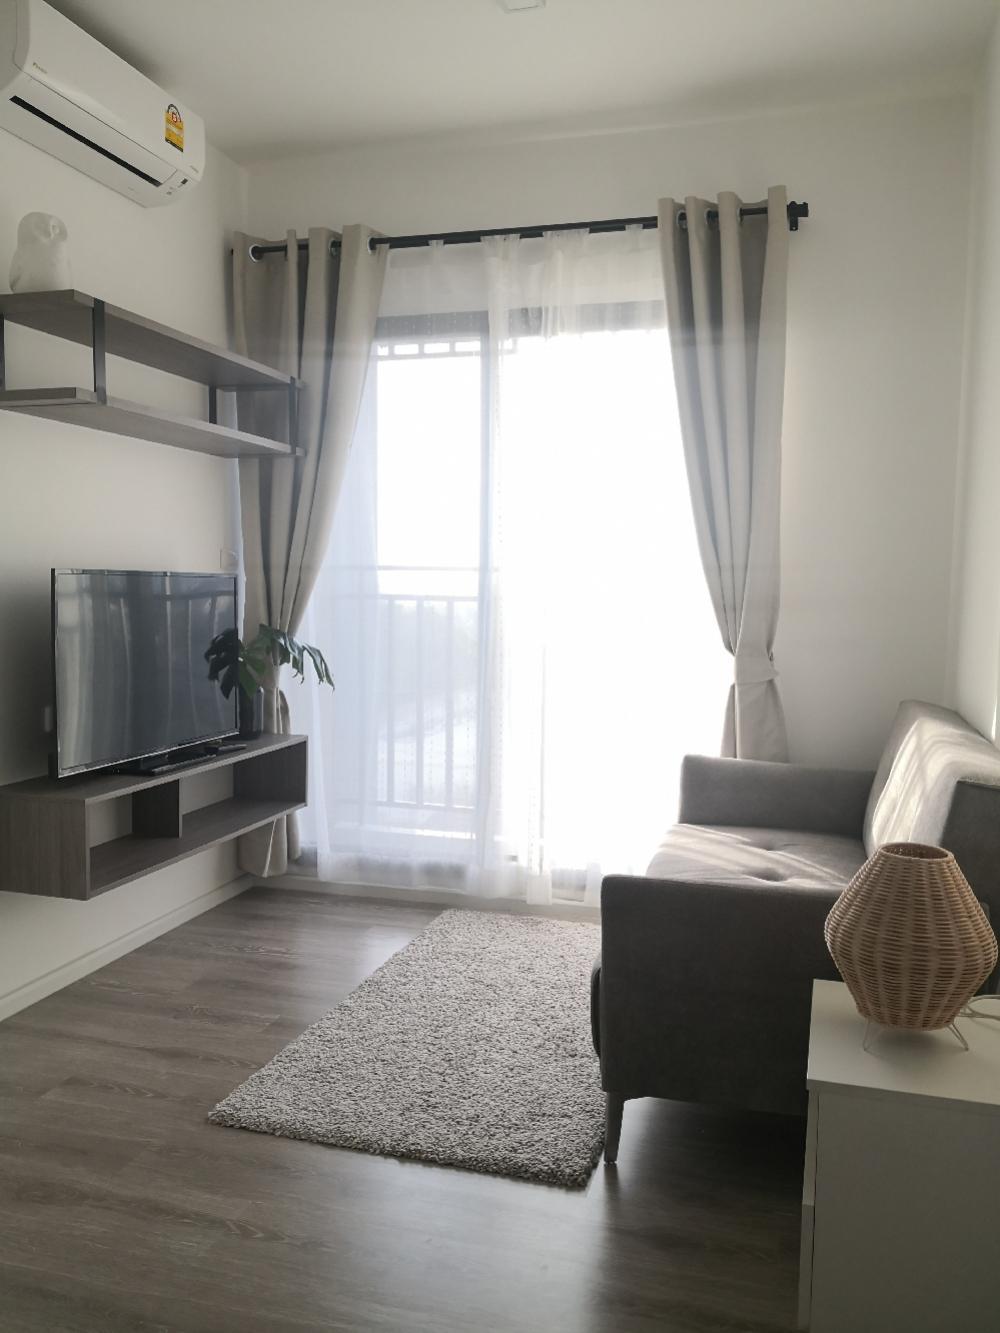 For SaleCondoSamrong, Samut Prakan : (For sale) Kensington Sukhumvit-Teparak condominium 1,700,000 Baht